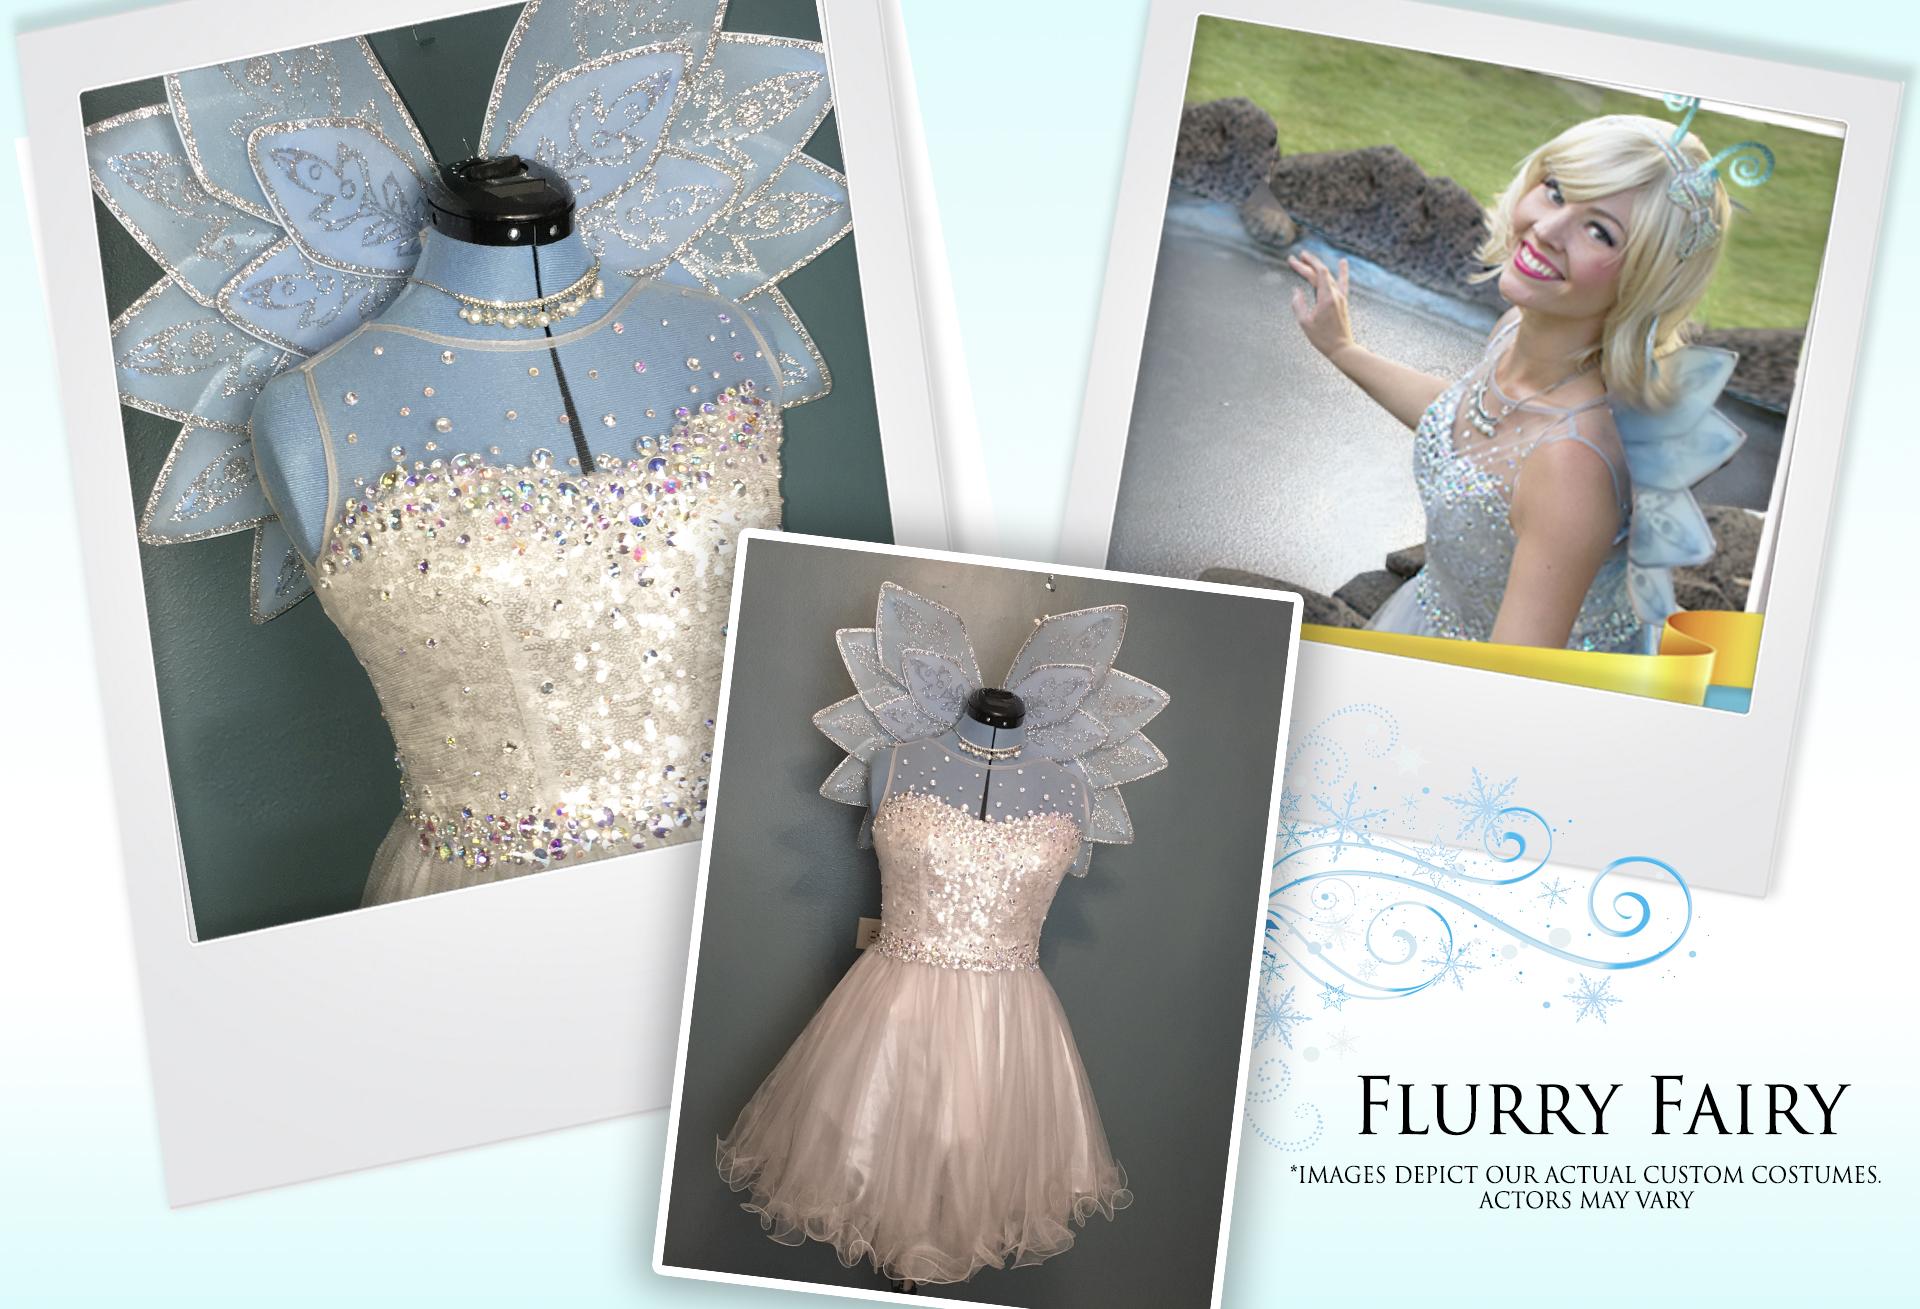 Flurry Fairy